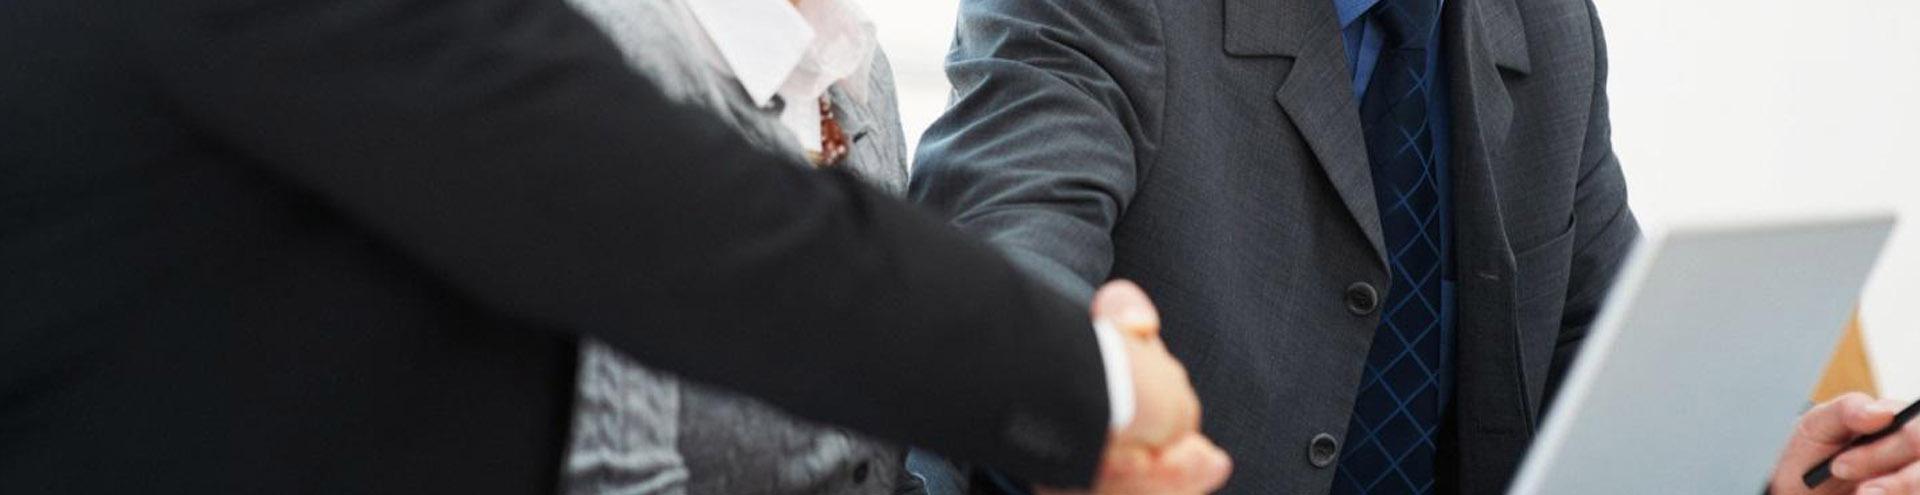 консультация юриста в Оренбурге